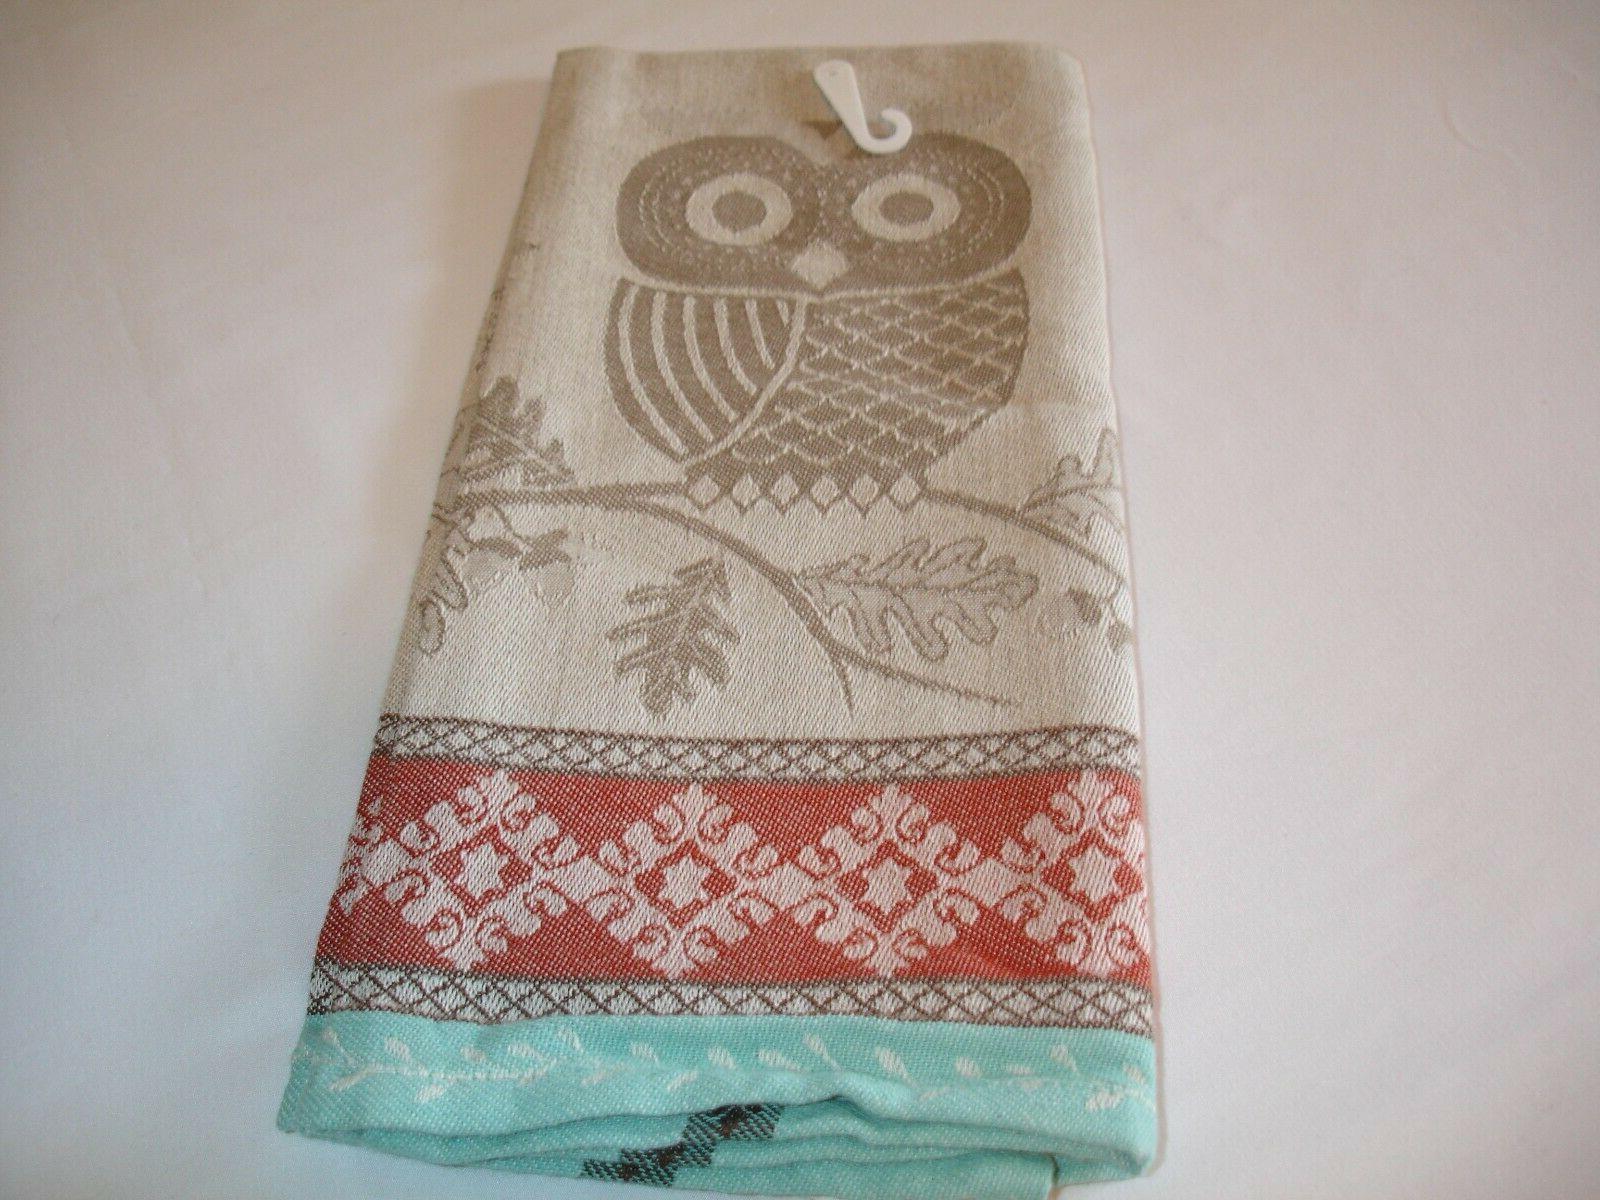 new! wildlife oak owl jacquard dish towel te